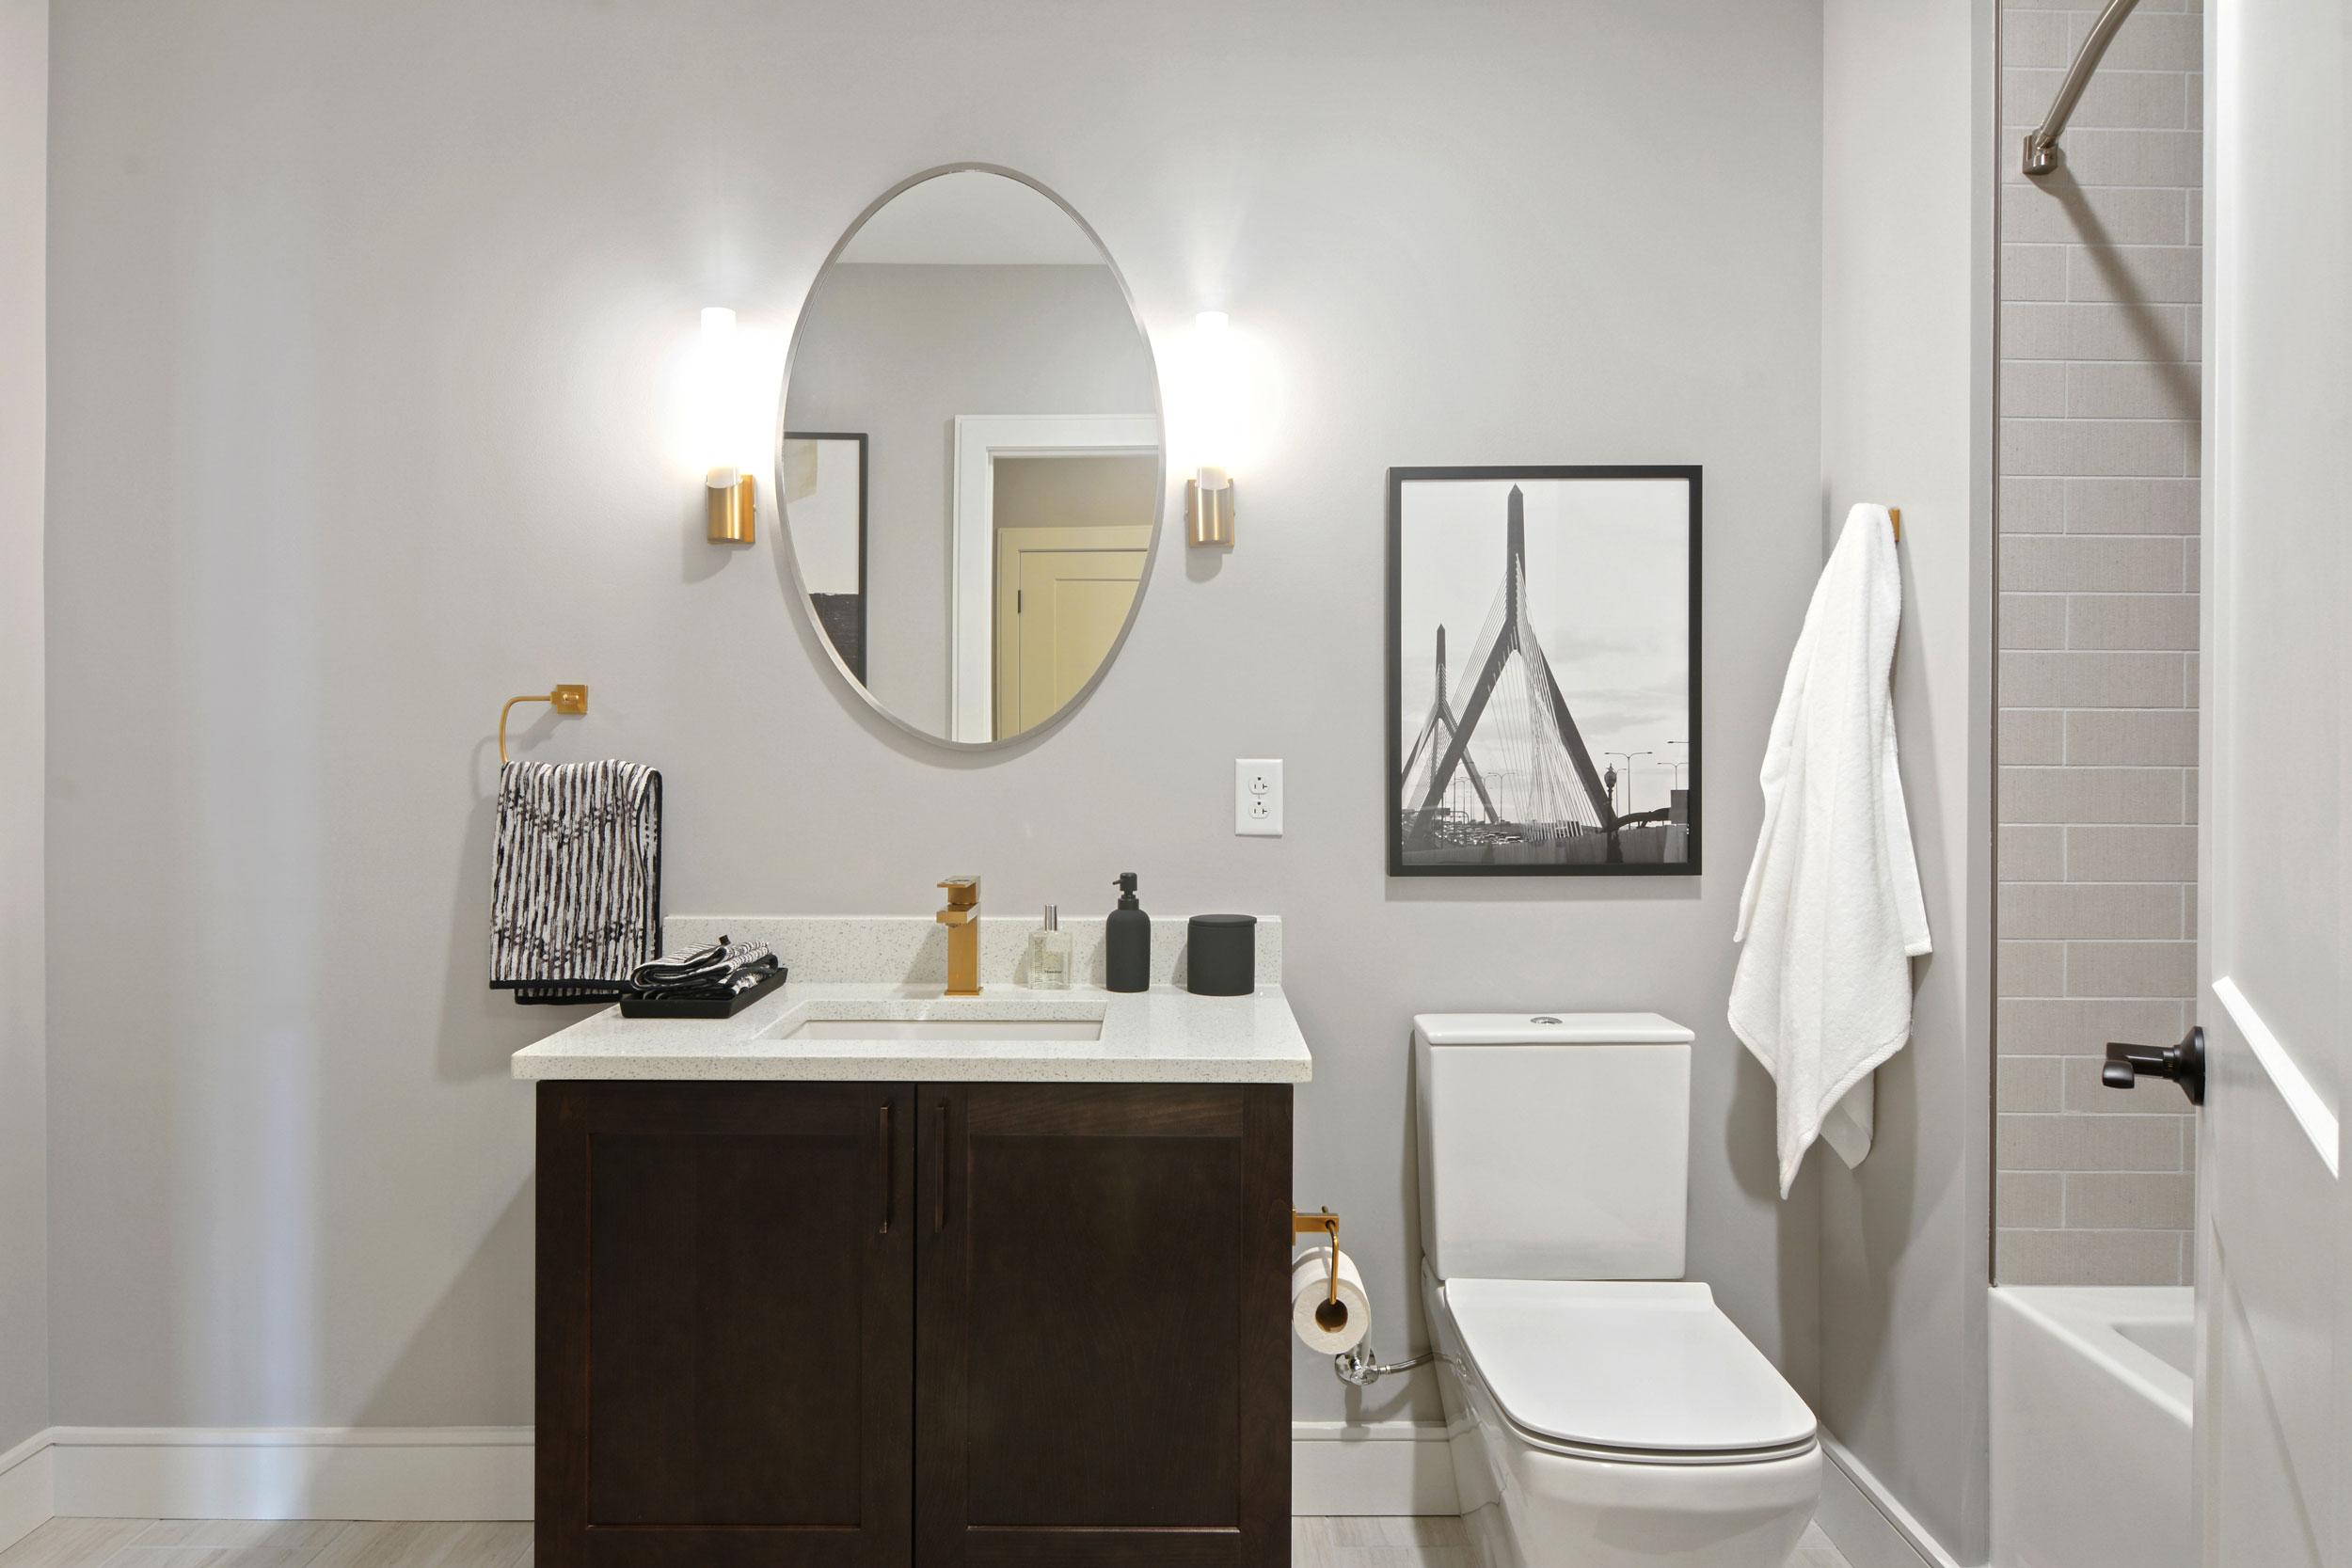 Restroom at The Bradford, featuring white quartz countertops, dark cabinets, round mirror